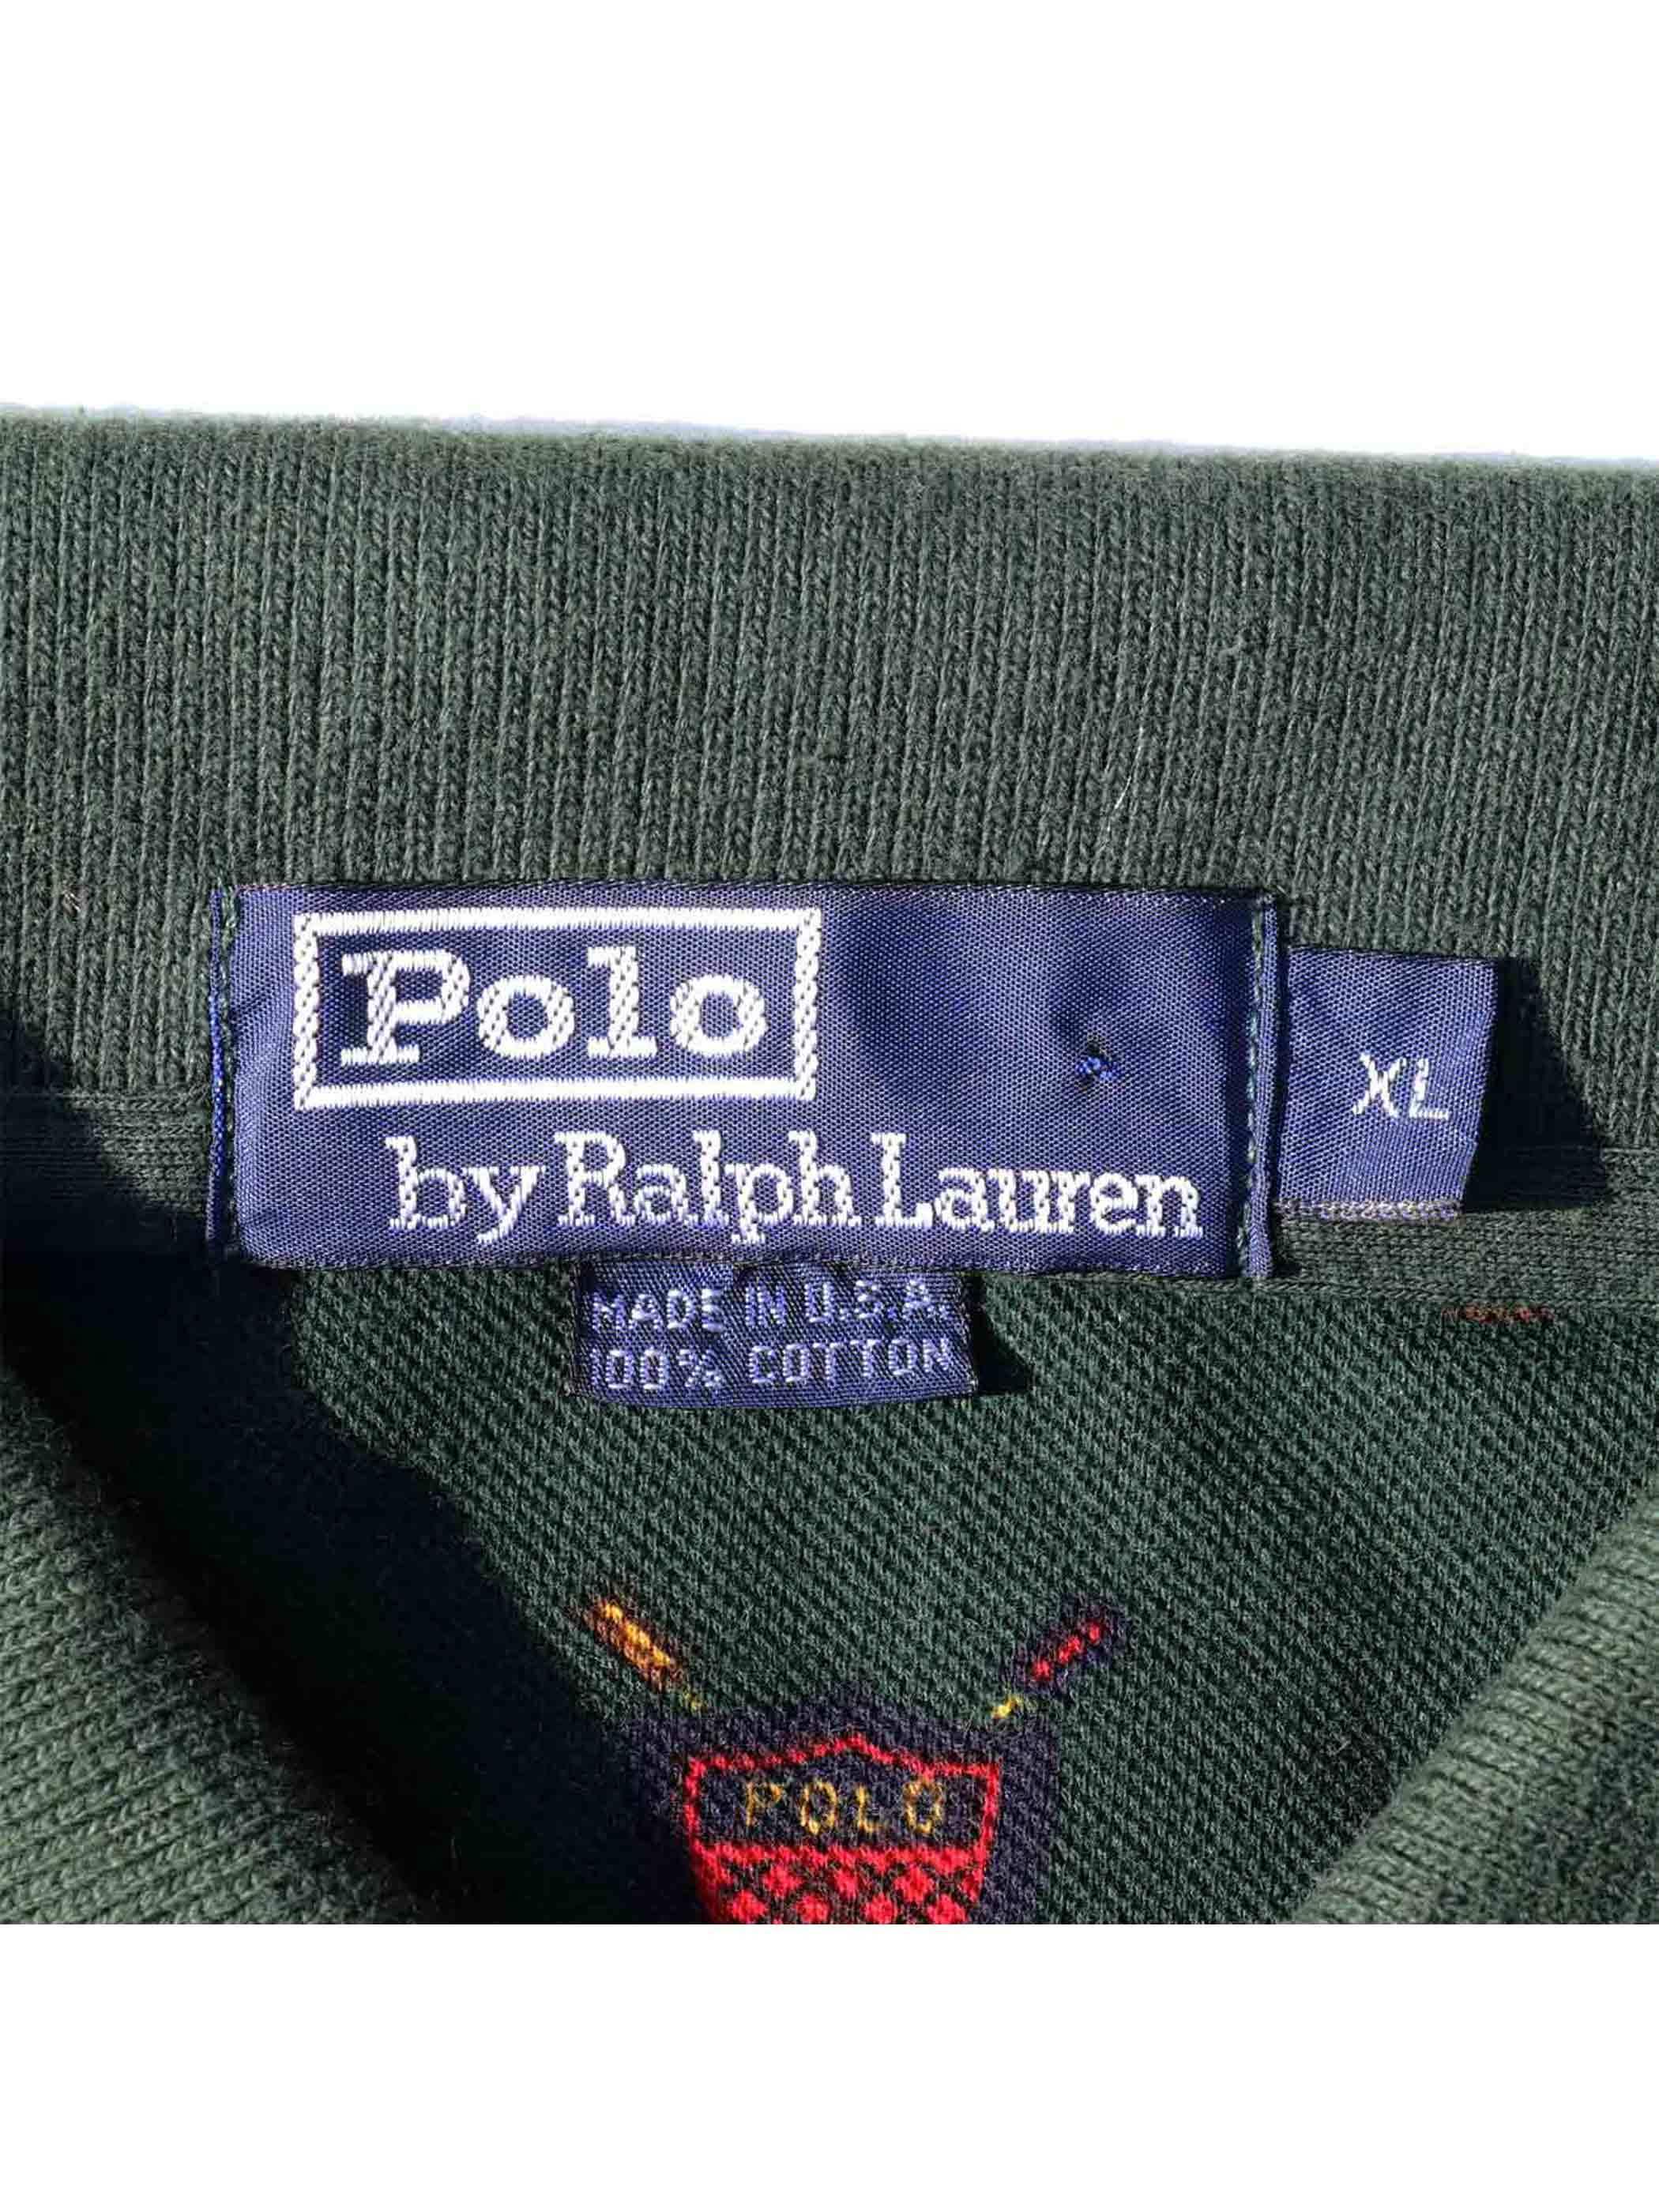 90's POLO RALPH LAUREN USA製 ダークグリーン 総柄 ポロシャツ [XL]